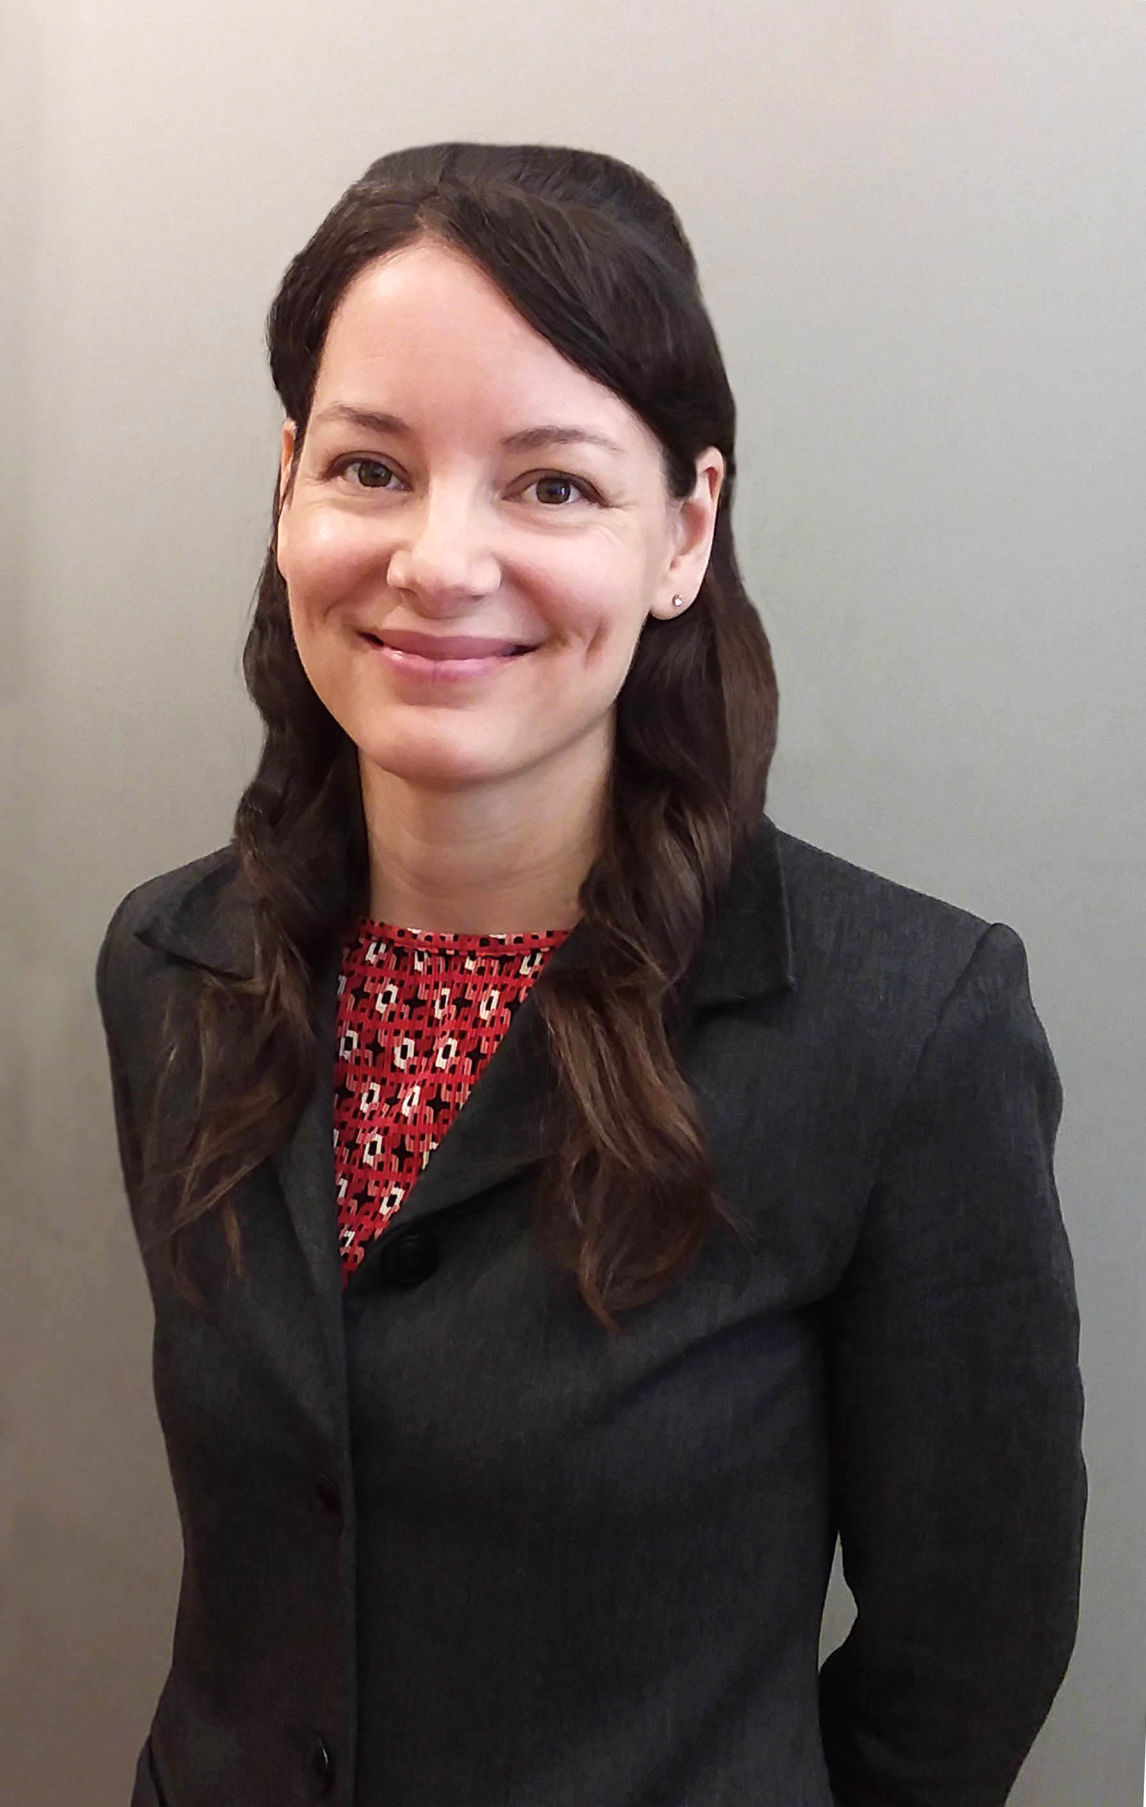 Annie Eskelin